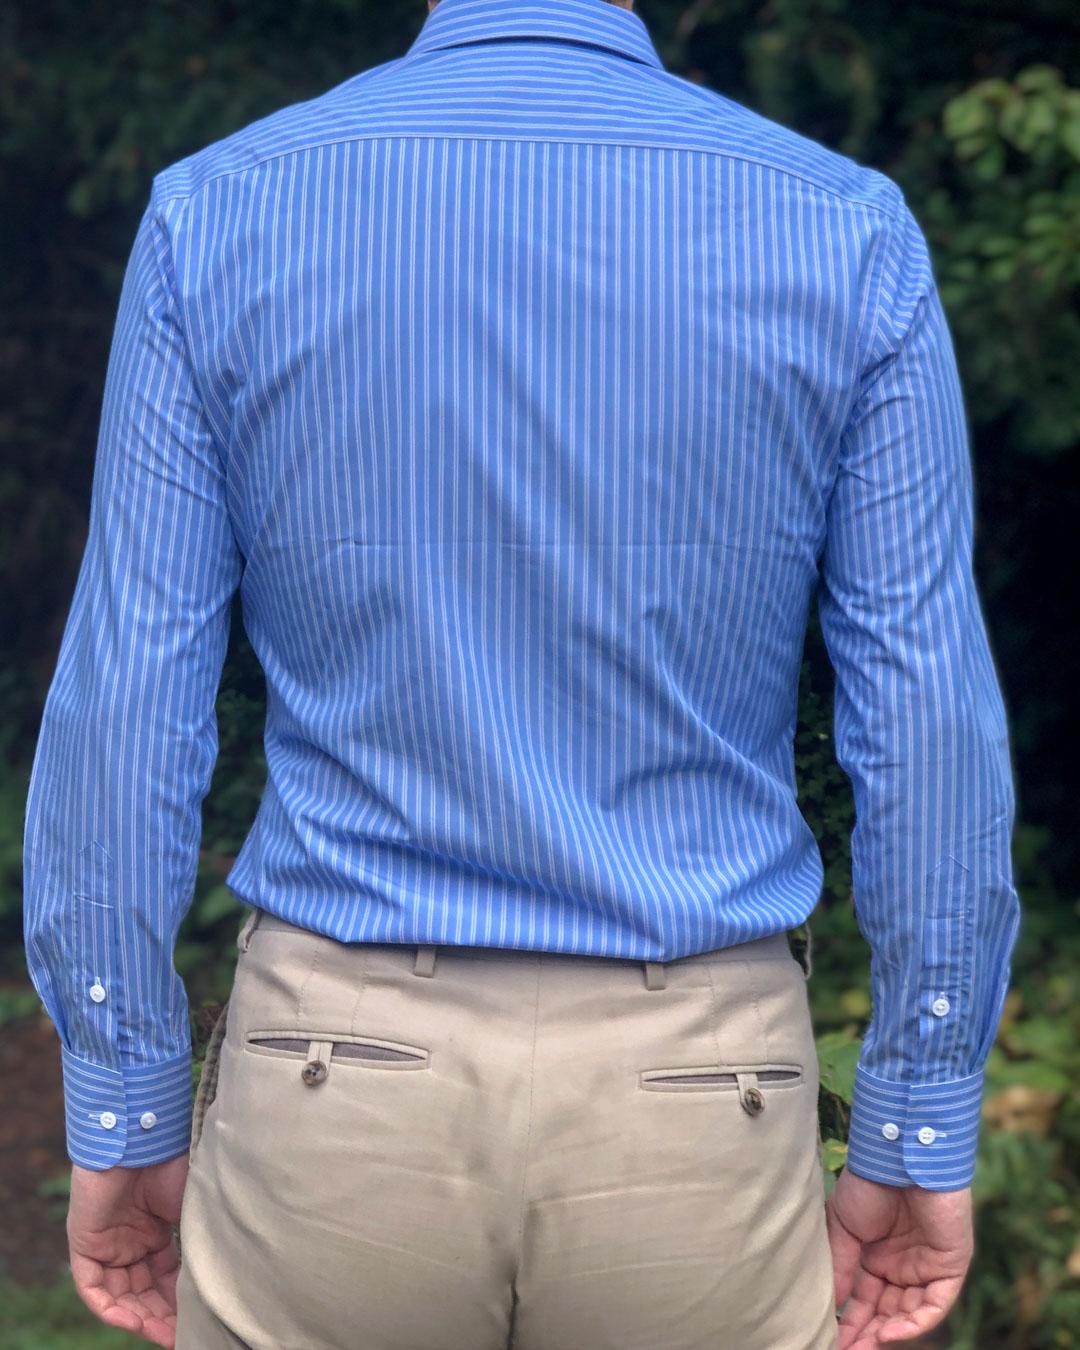 MatchU Tailor Blue Bamboo Striped Shirt Review